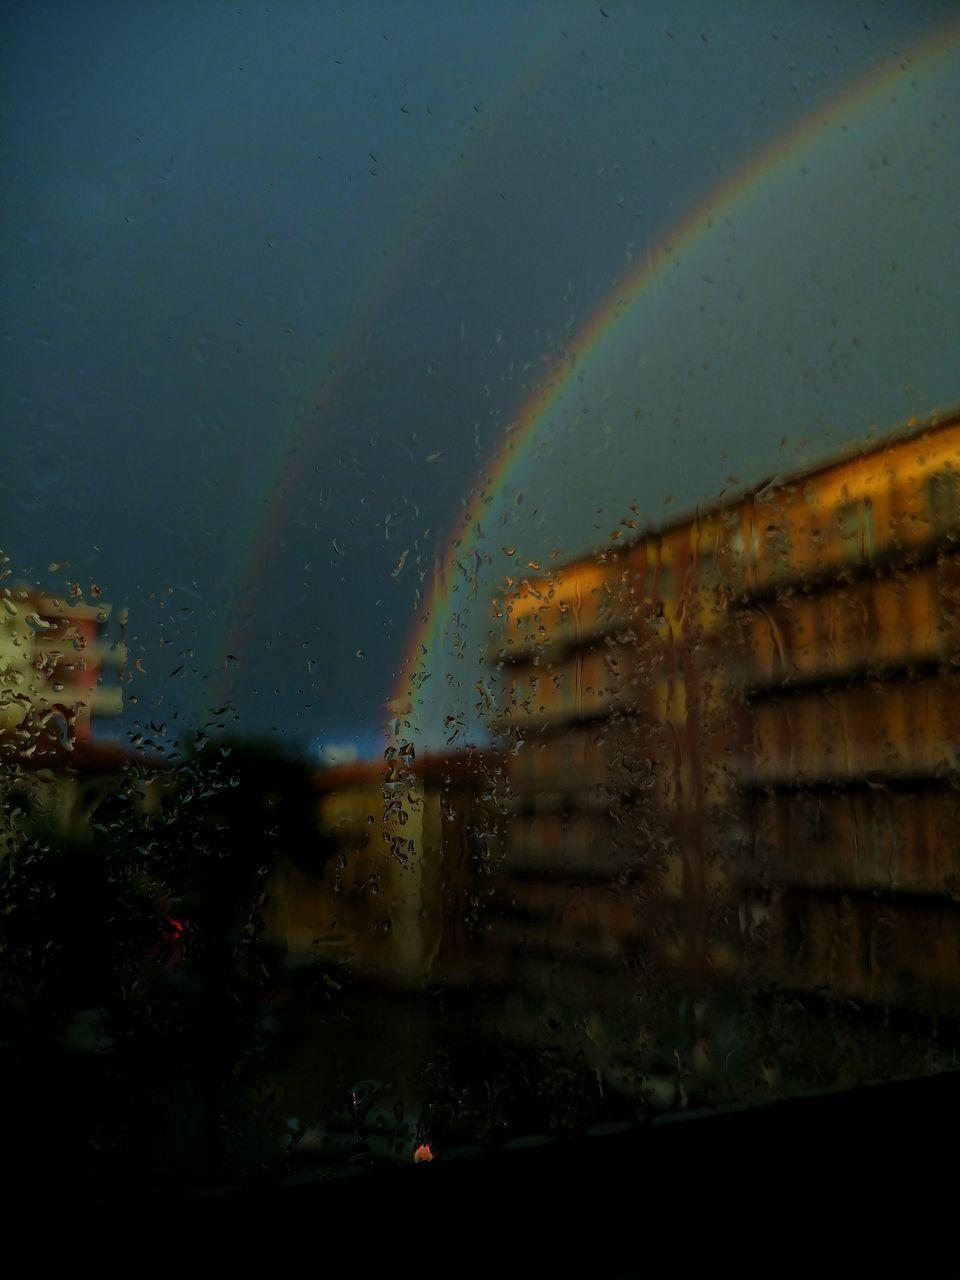 RAINBOW OVER CITY BUILDINGS SEEN THROUGH WET WINDOW